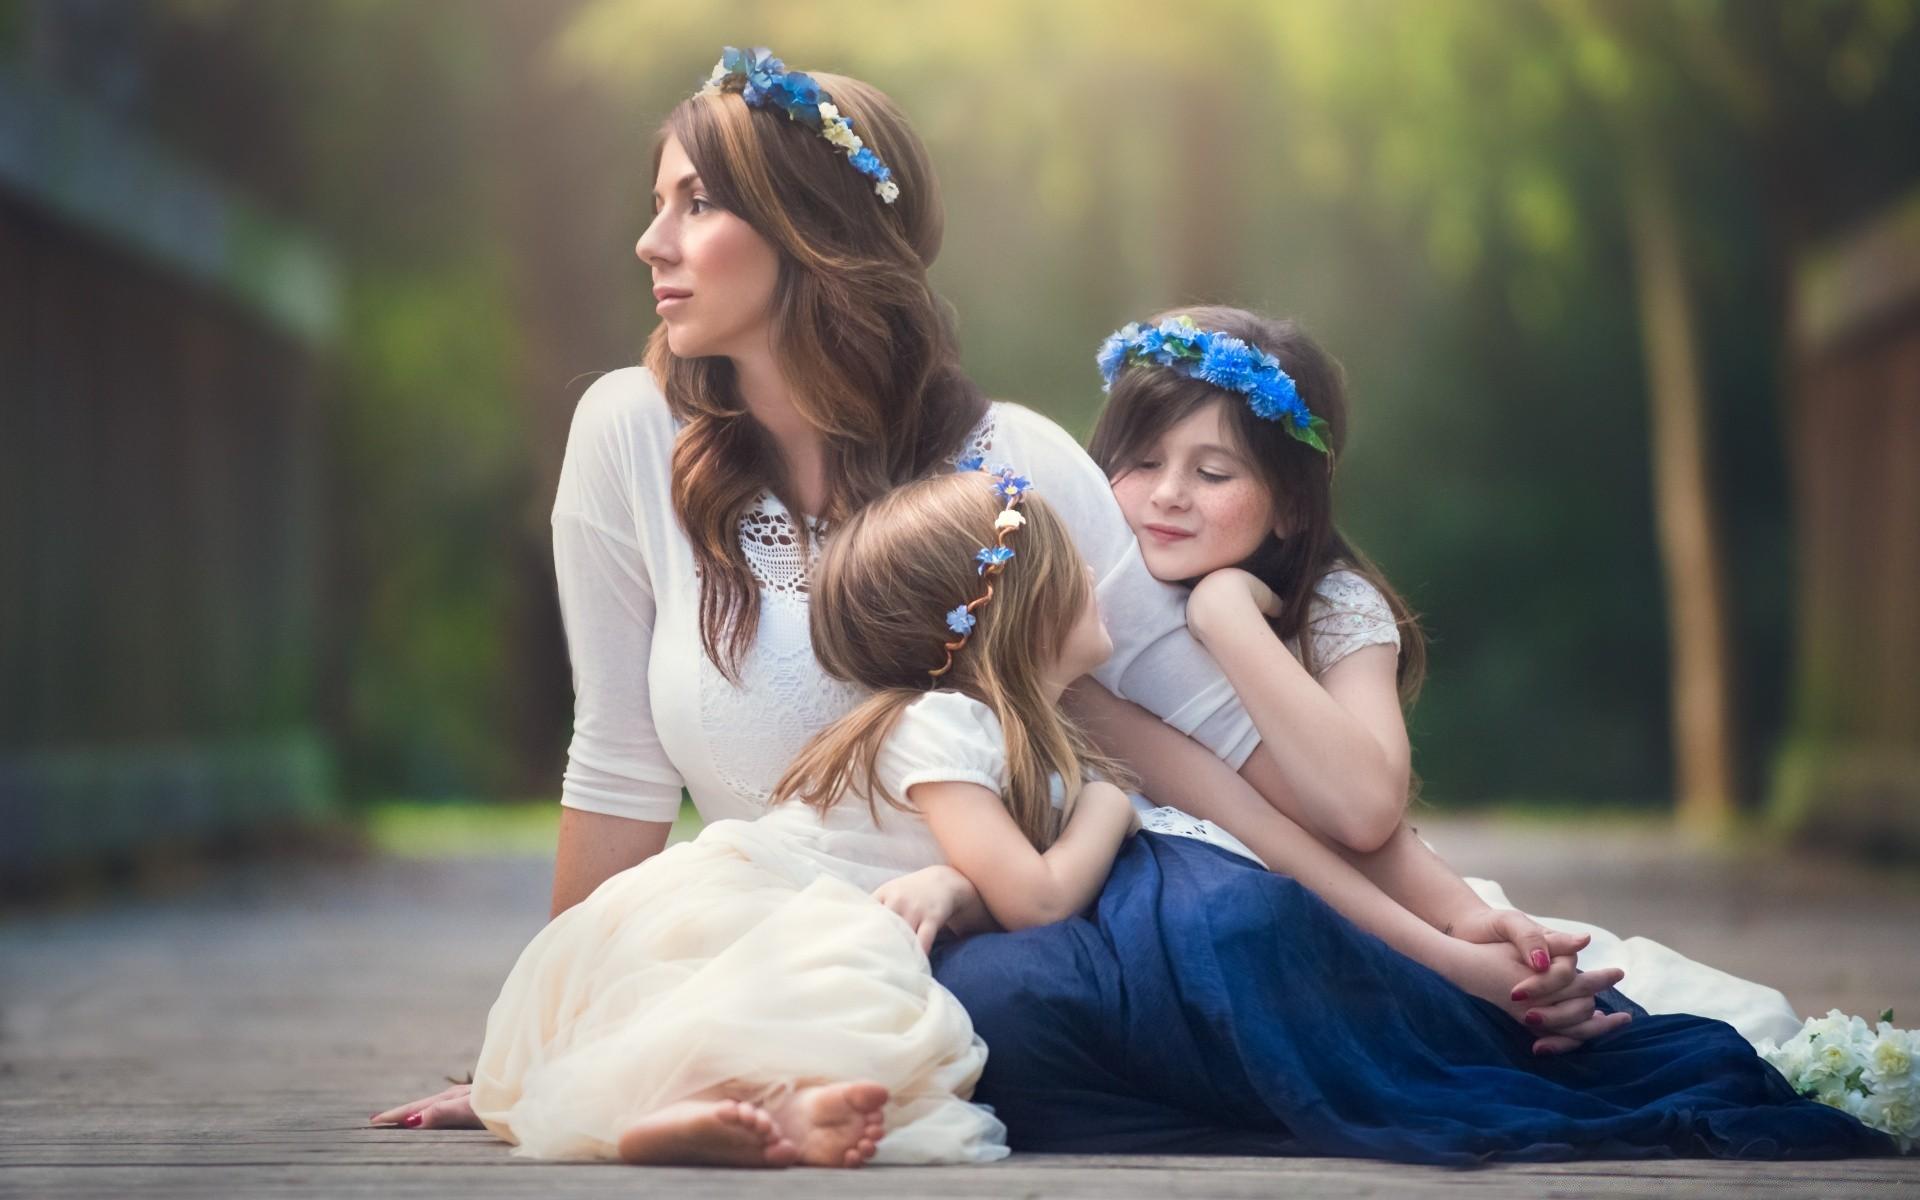 Картинка дочки матери